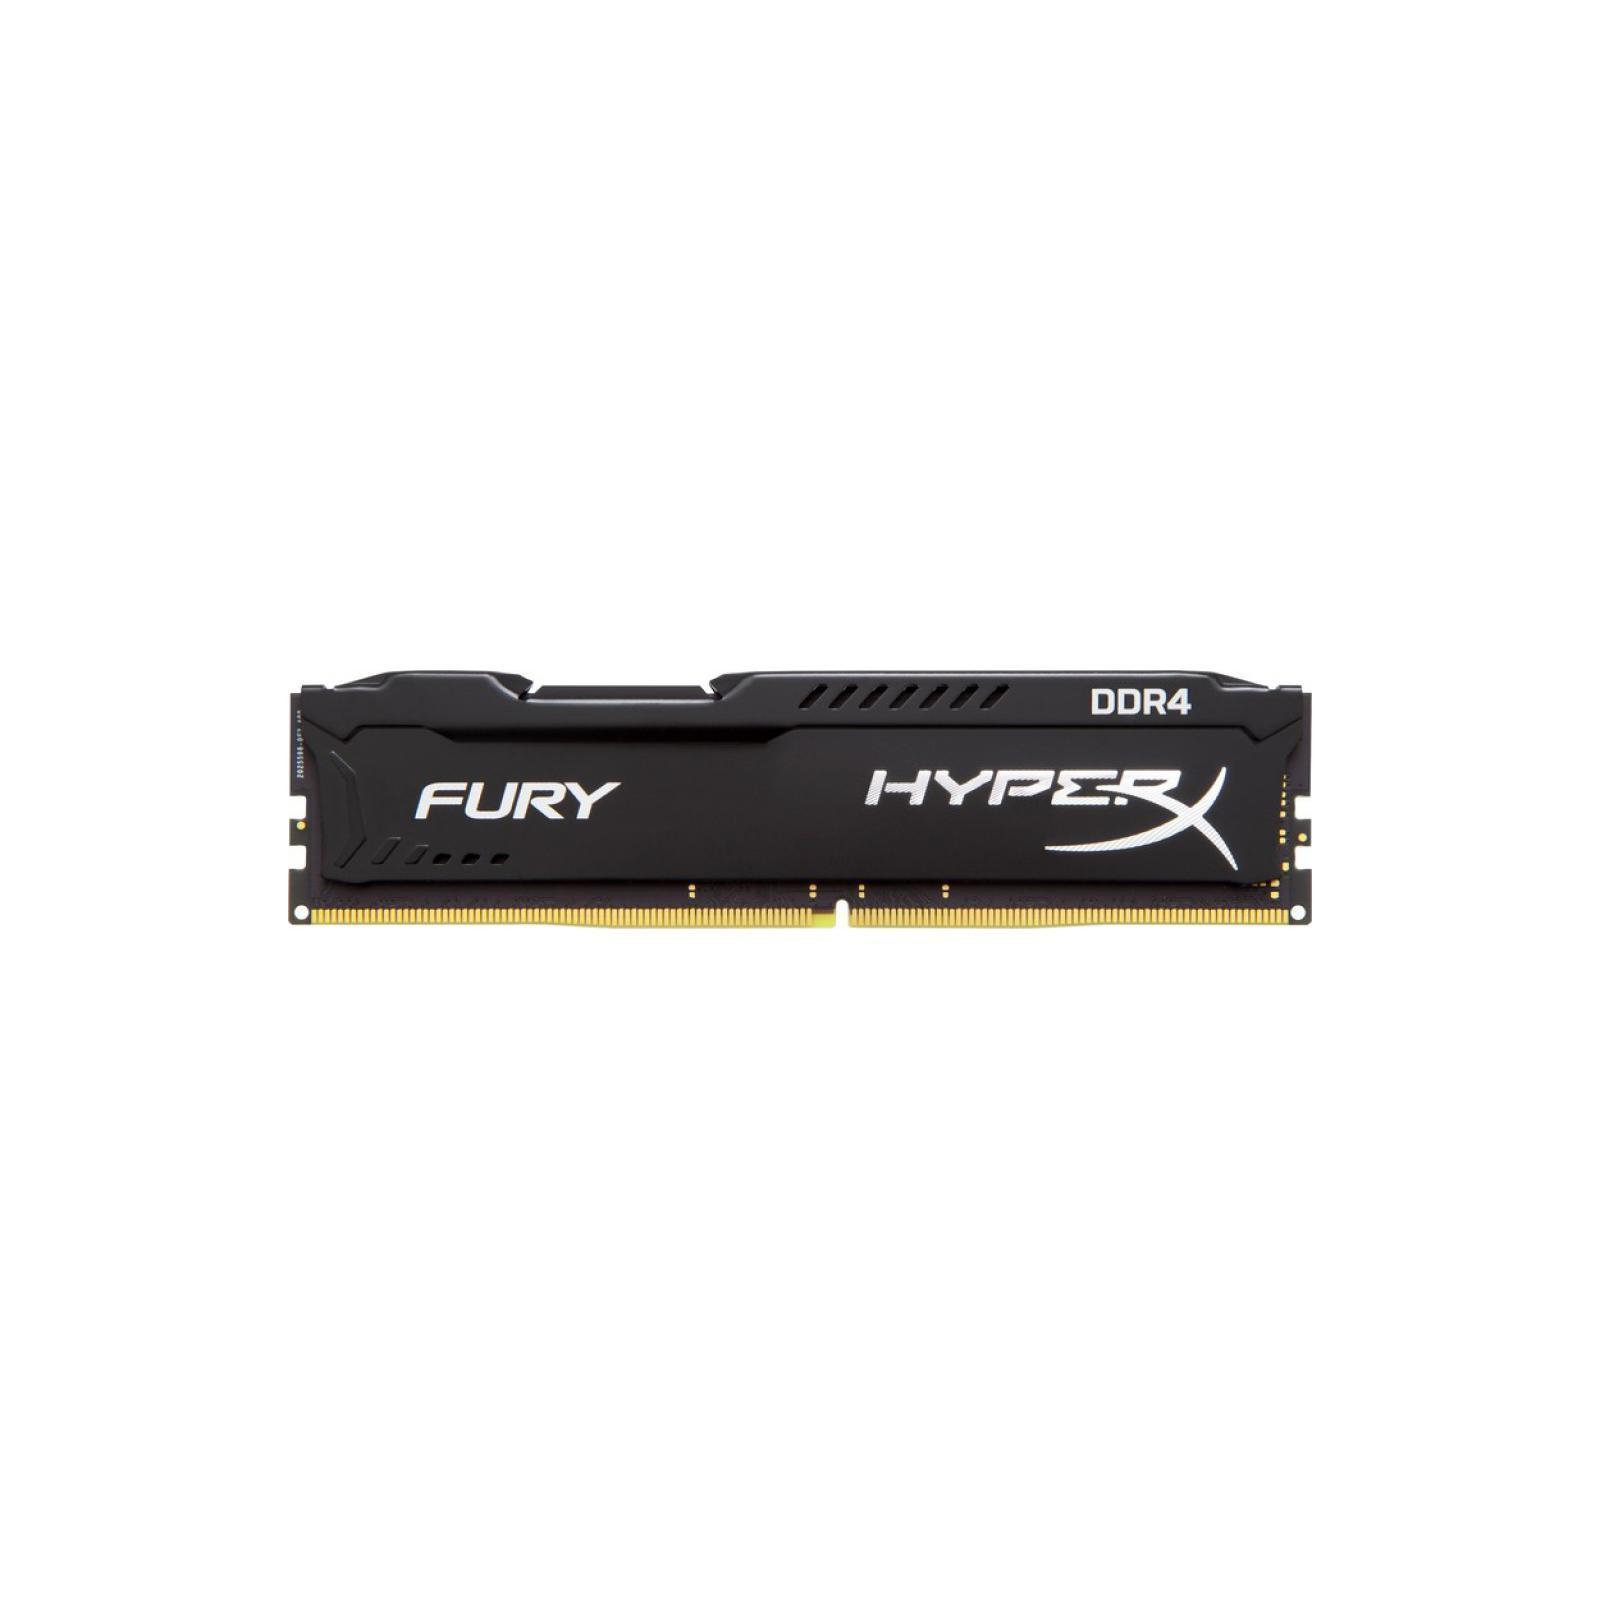 Модуль памяти для компьютера DDR4 8GB 3466 MHz HyperX FURY Black HyperX (Kingston Fury) (HX434C19FB2/8)